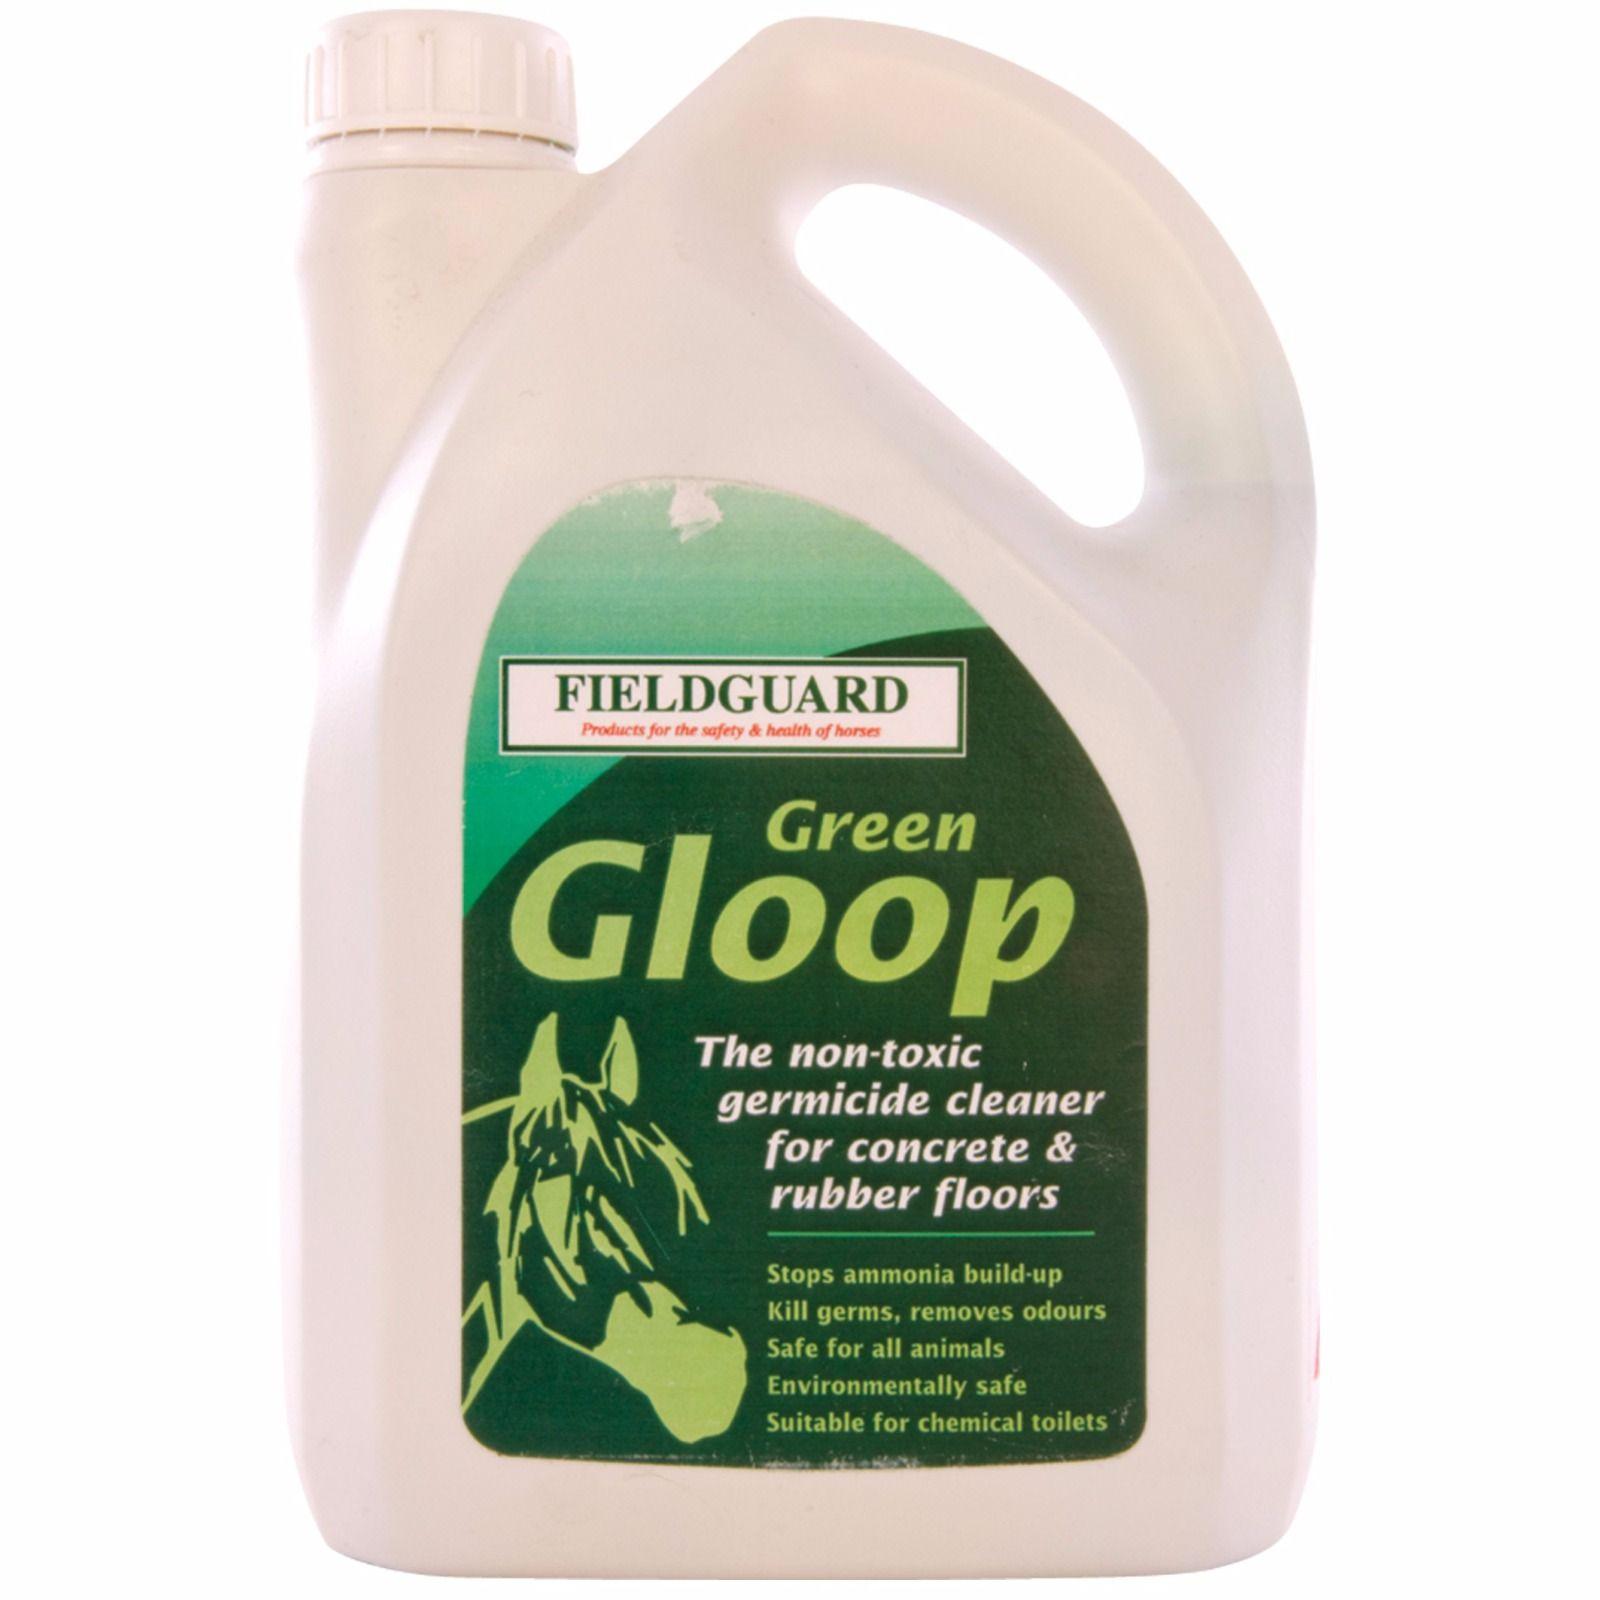 Fieldguard Green Gloop 2 Ltr